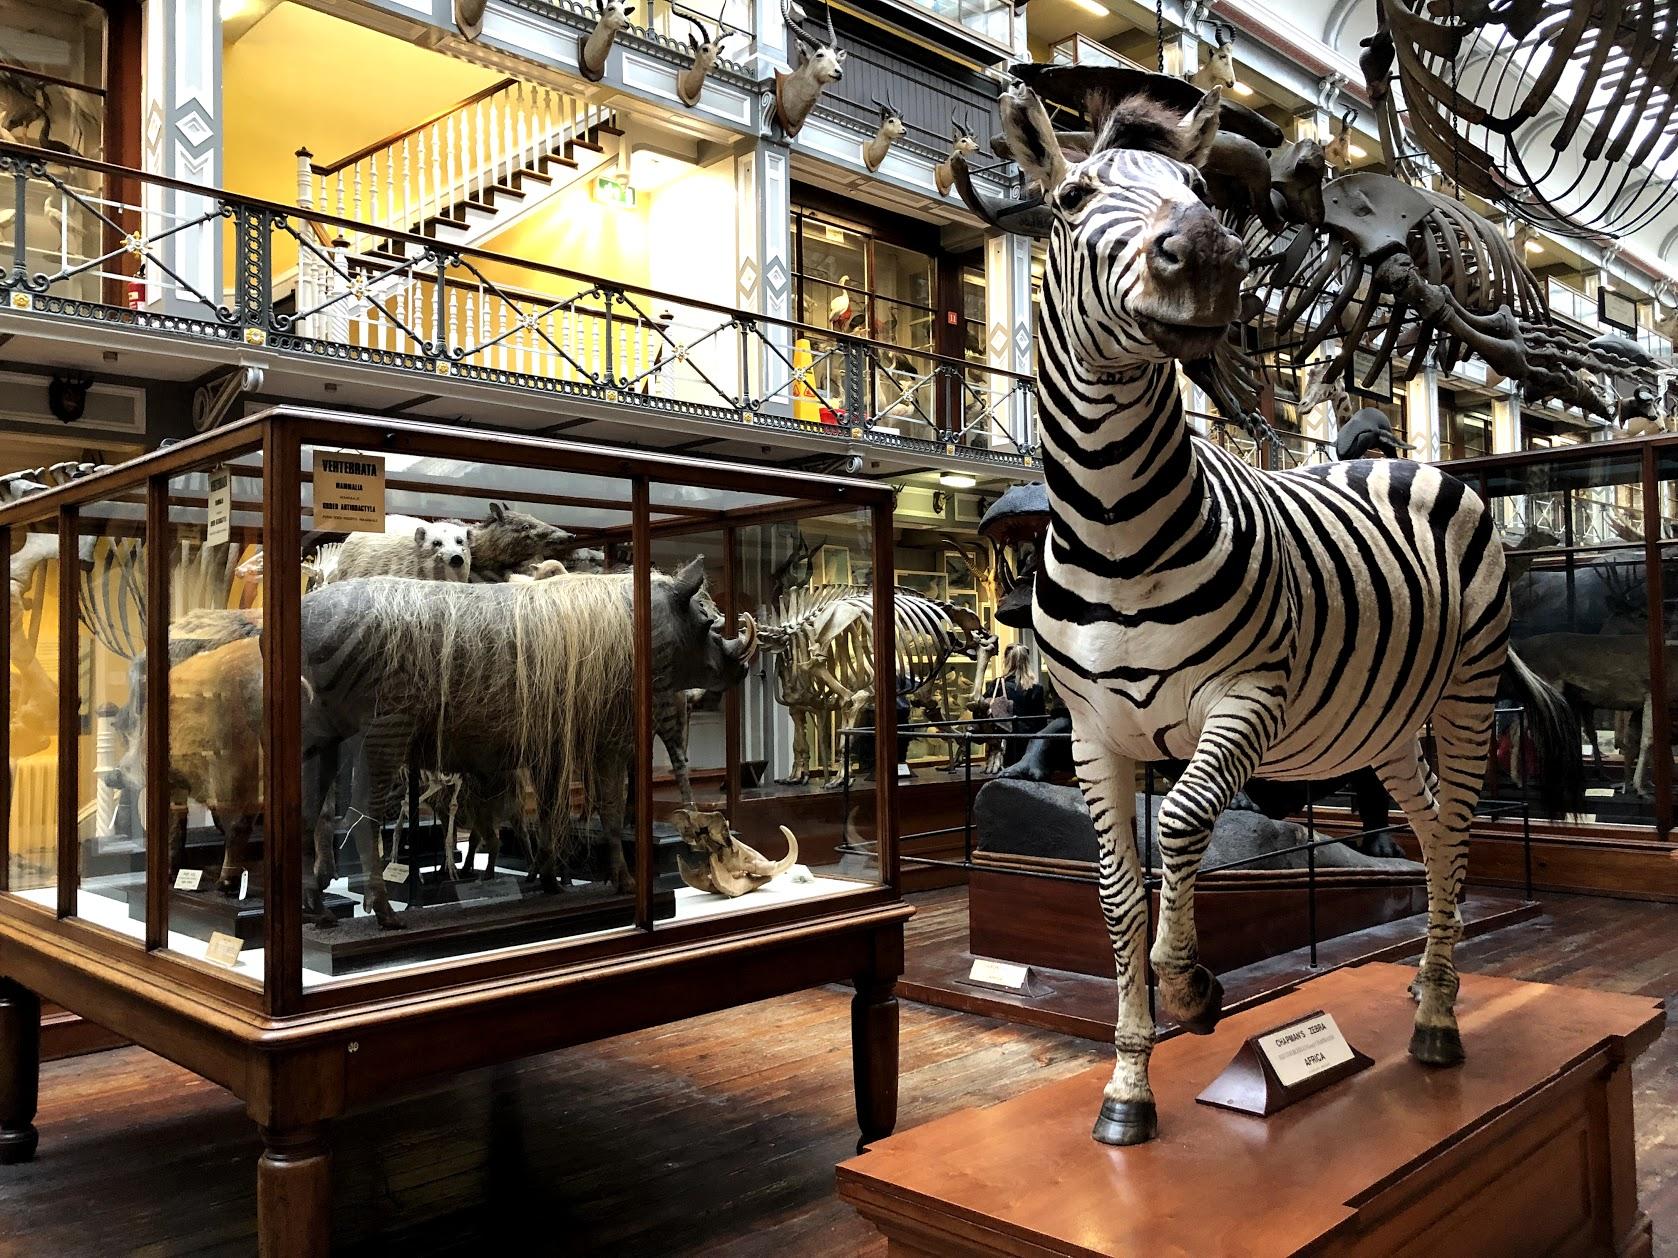 Museu de história natural, Dublin